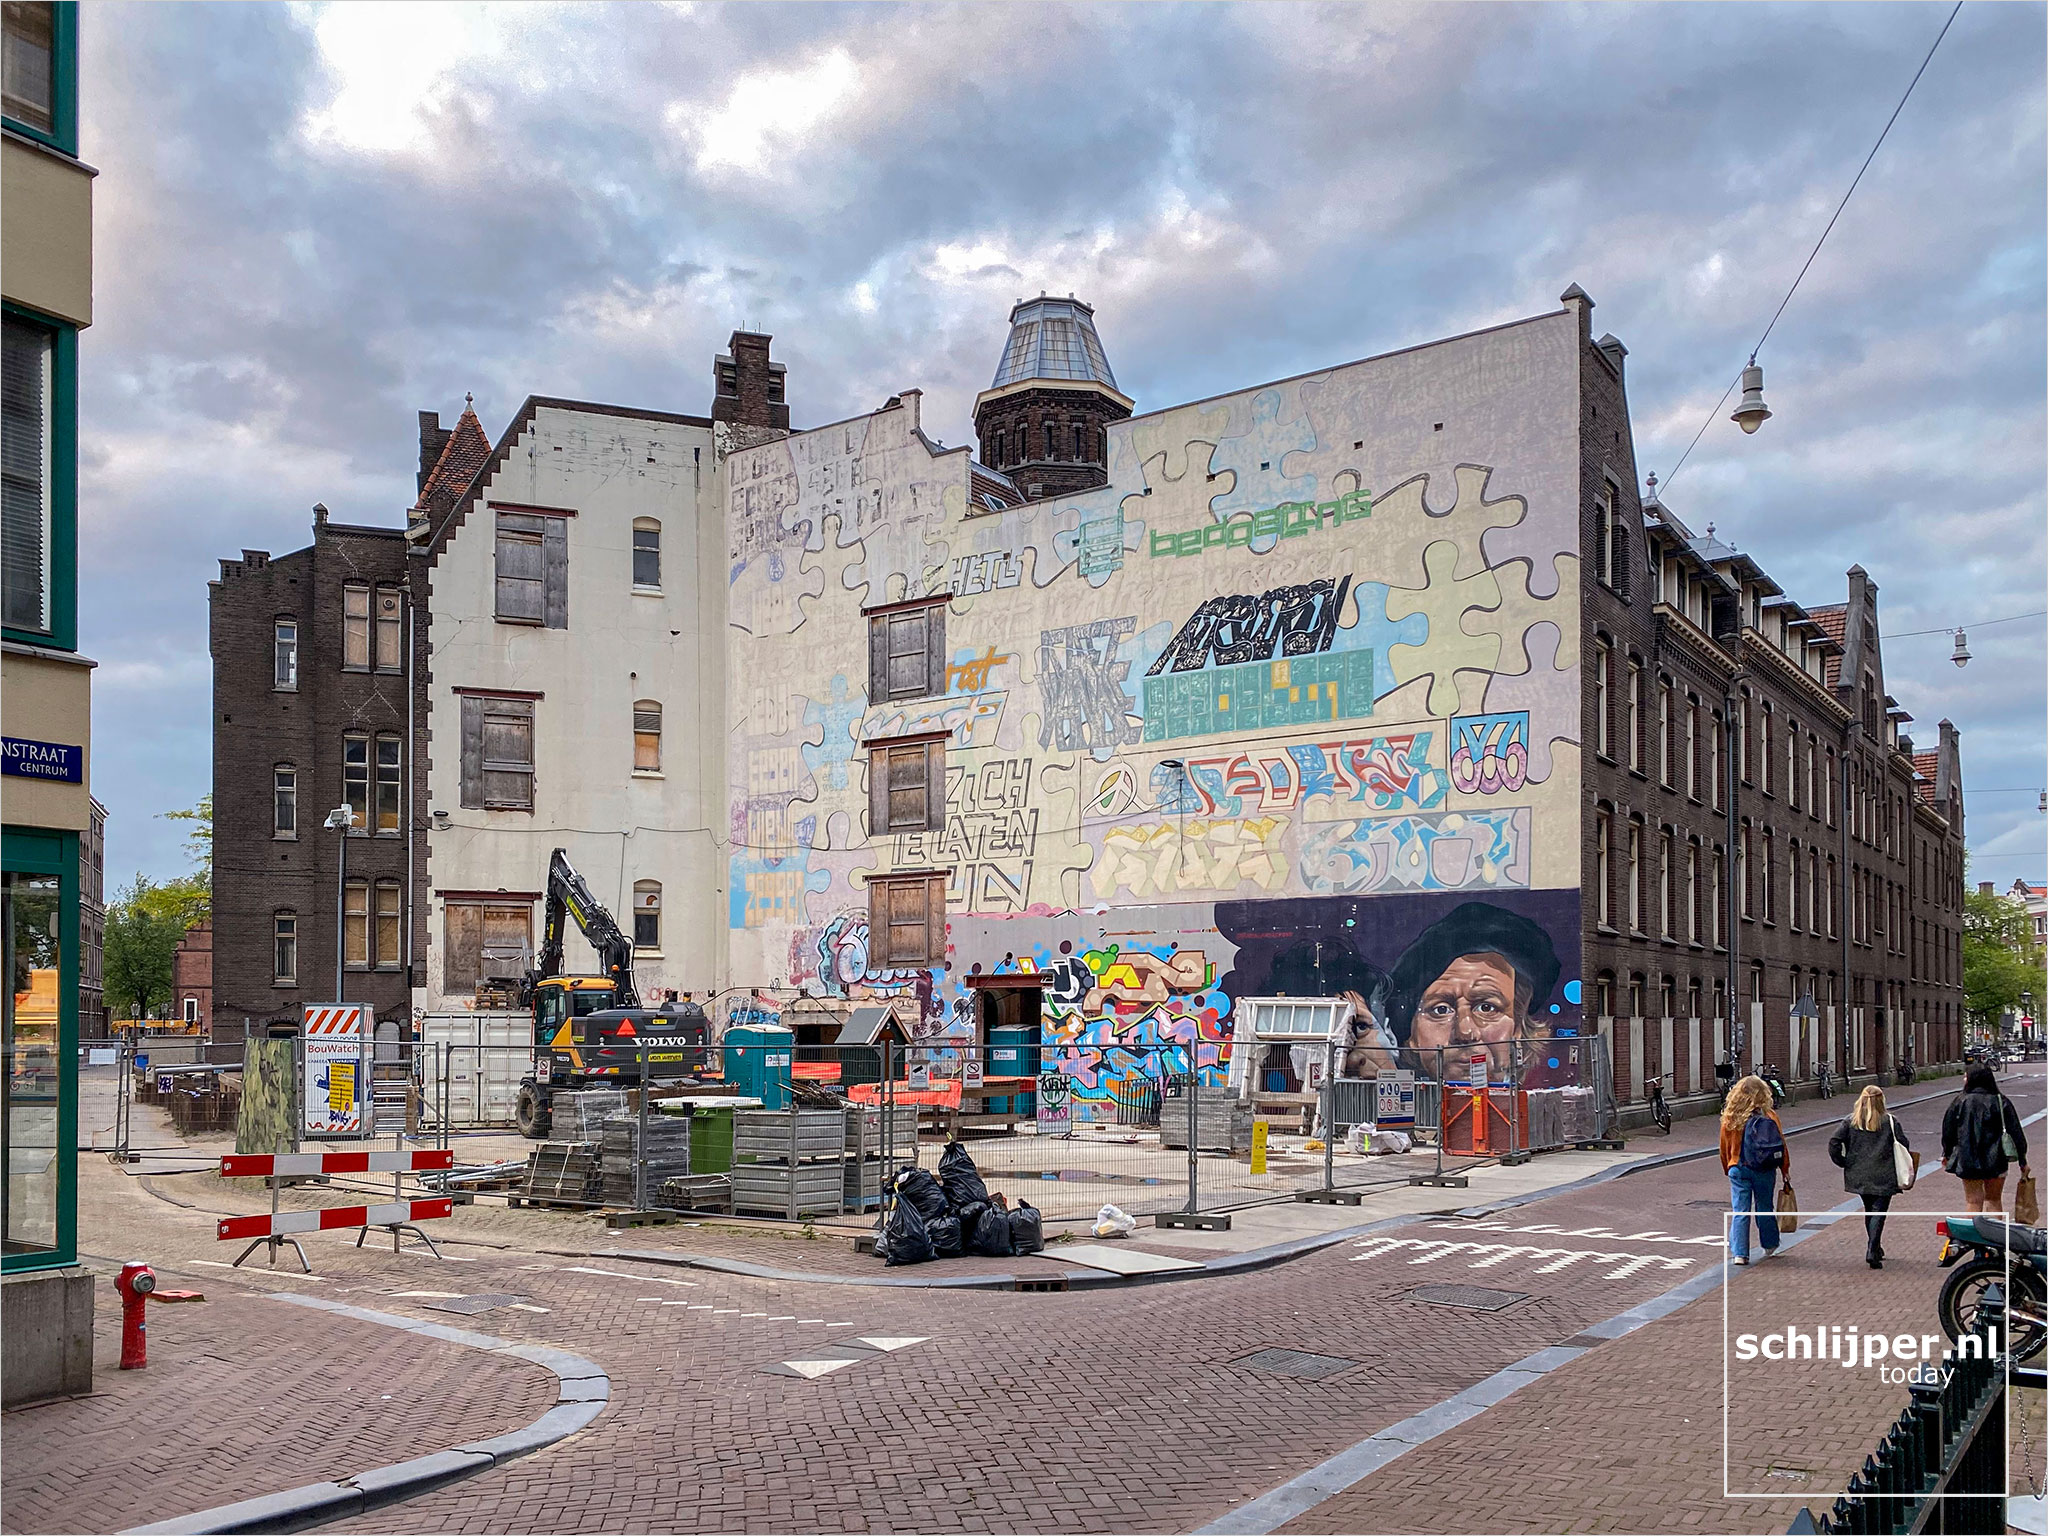 The Netherlands, Amsterdam, 18 augustus 2021